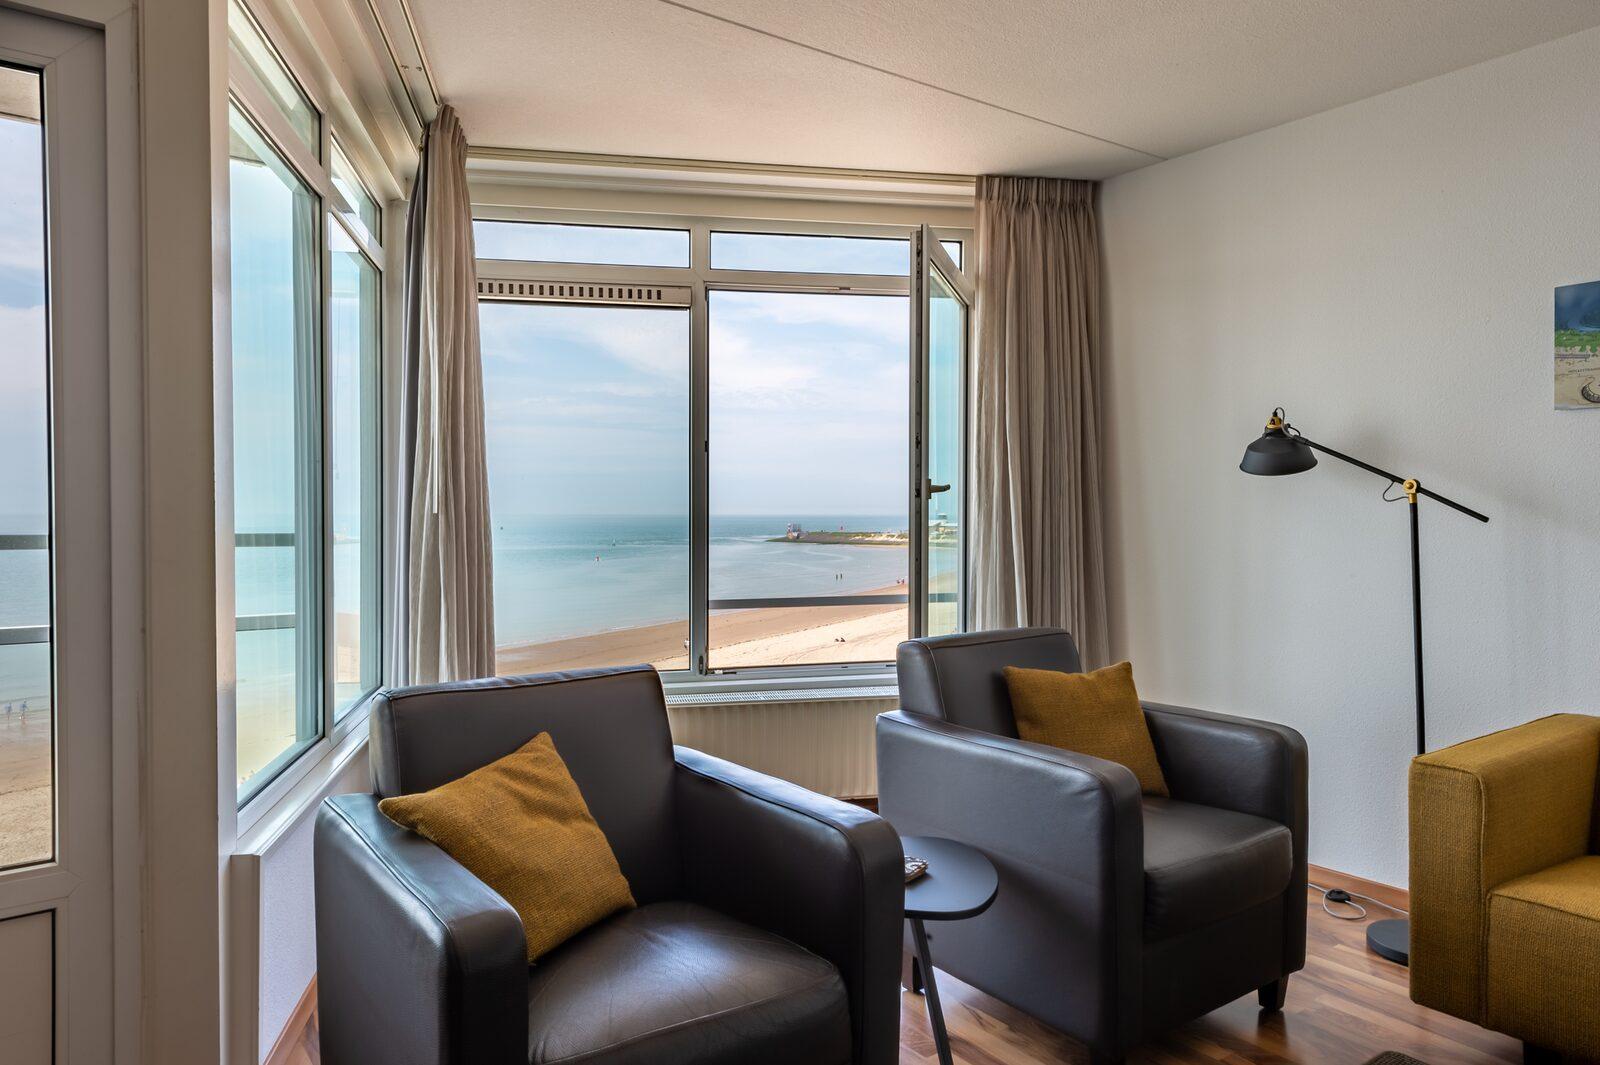 3-room corner apartment with ocean view